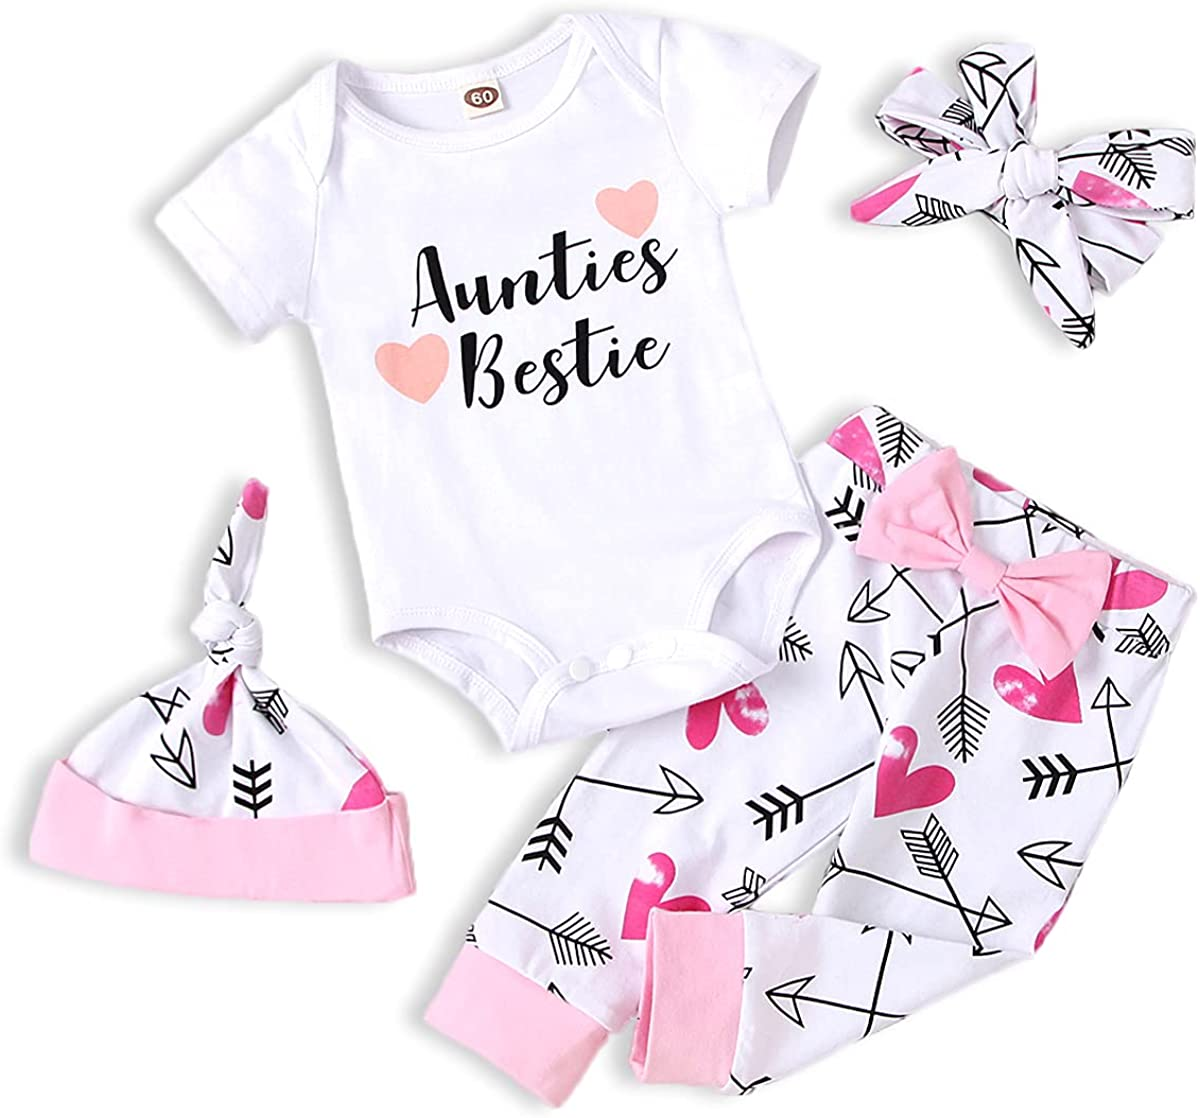 Newborn Baby Girls Aunties Max National products 60% OFF Bestie Bowknot Top Headb Romper Pants